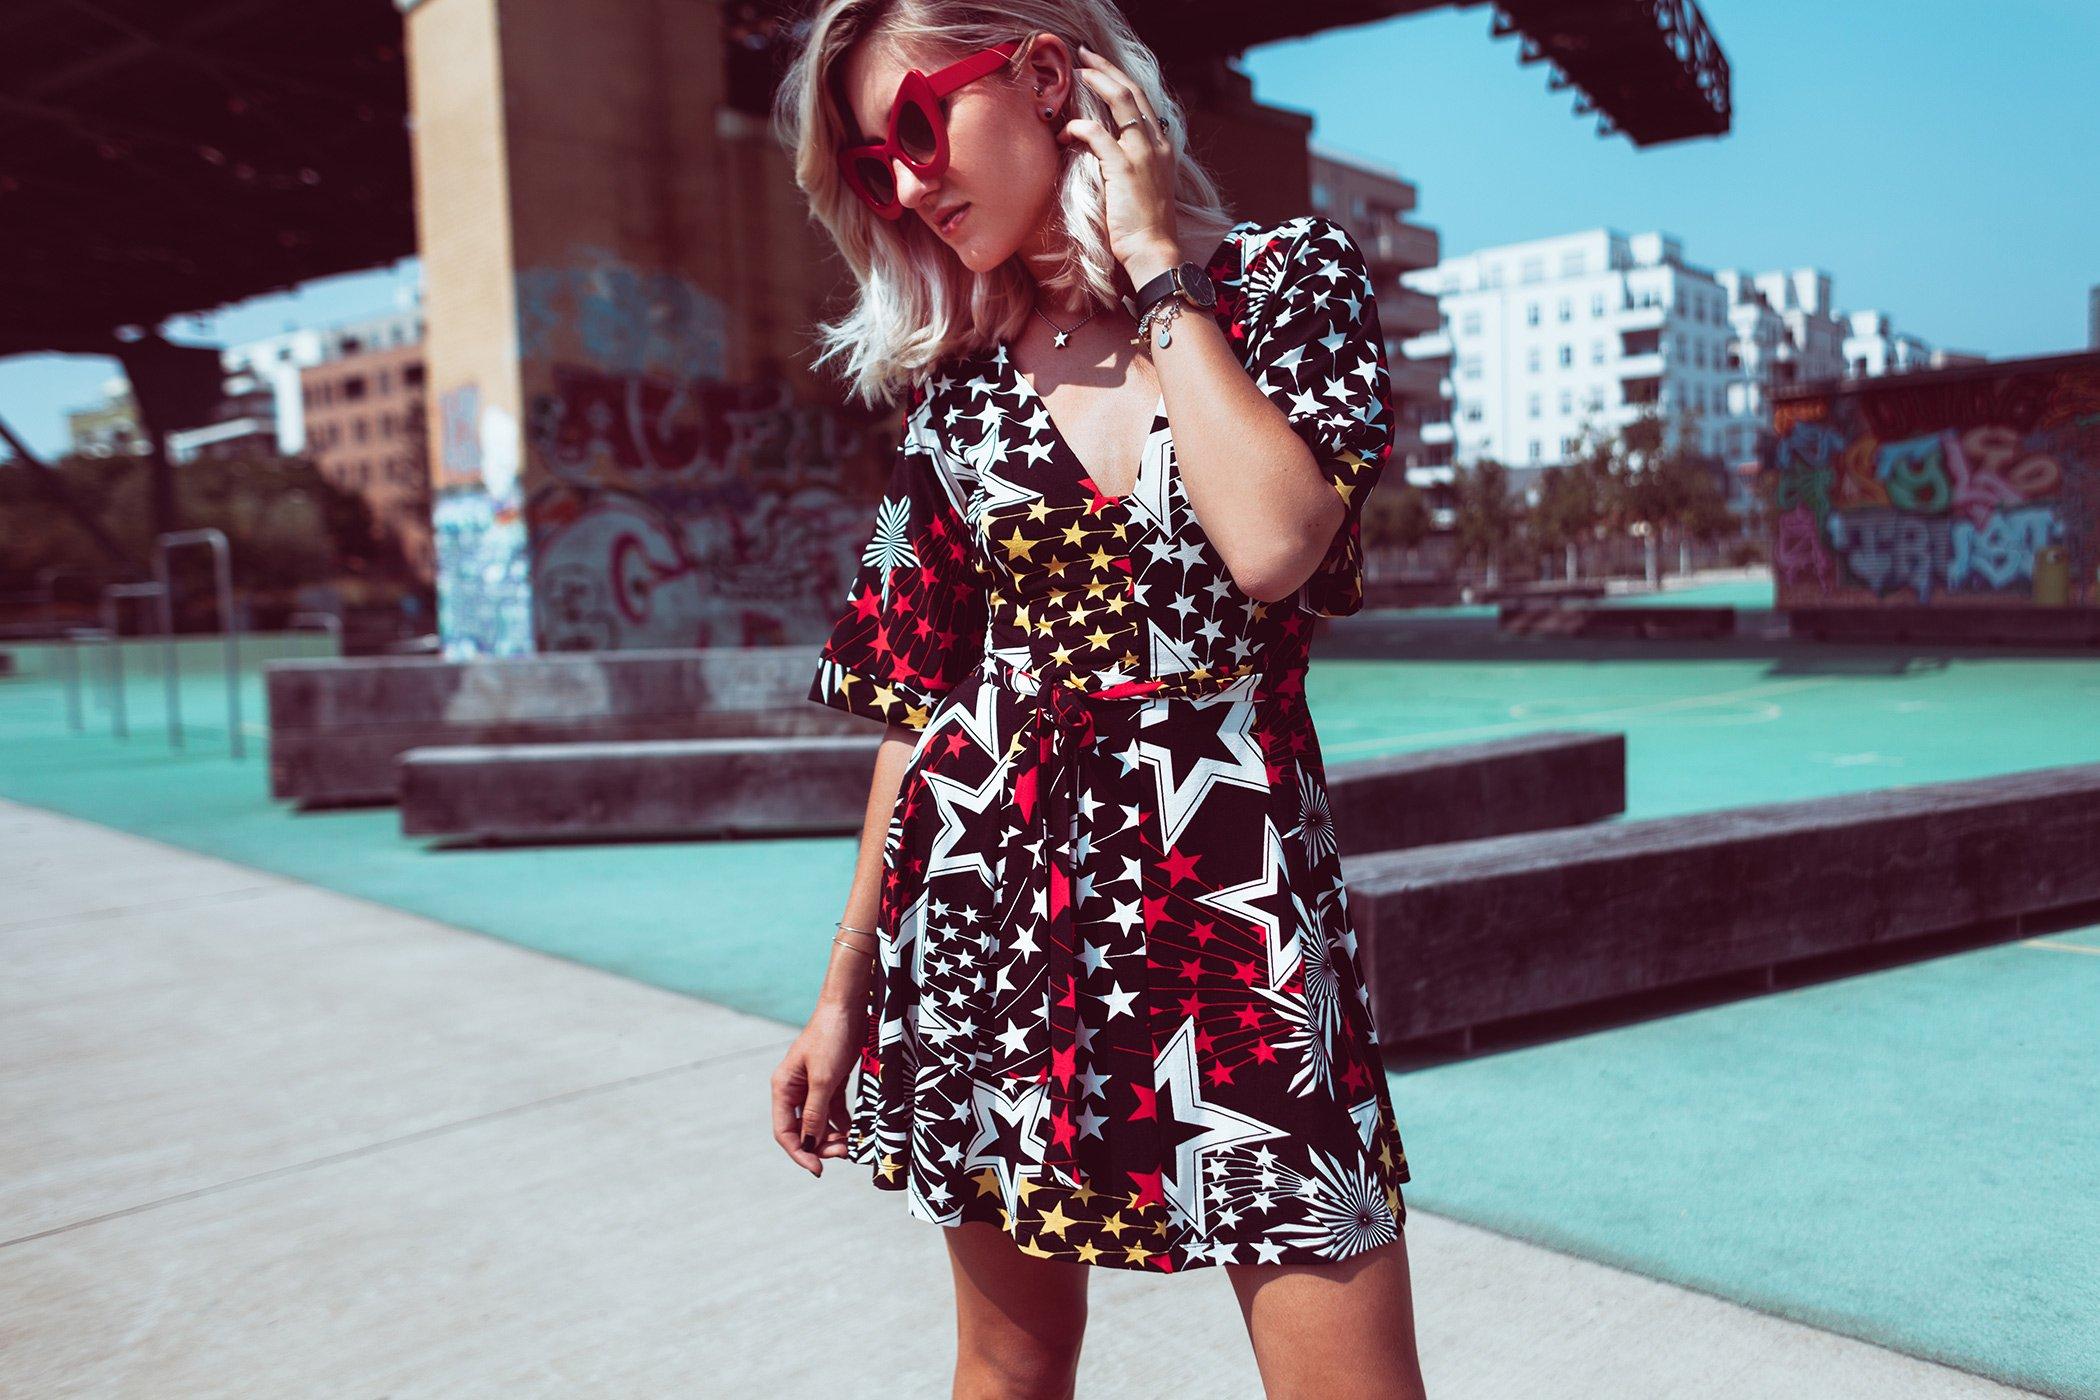 mikuta-star-dress-and-red-cat-eye-sunglasses-5